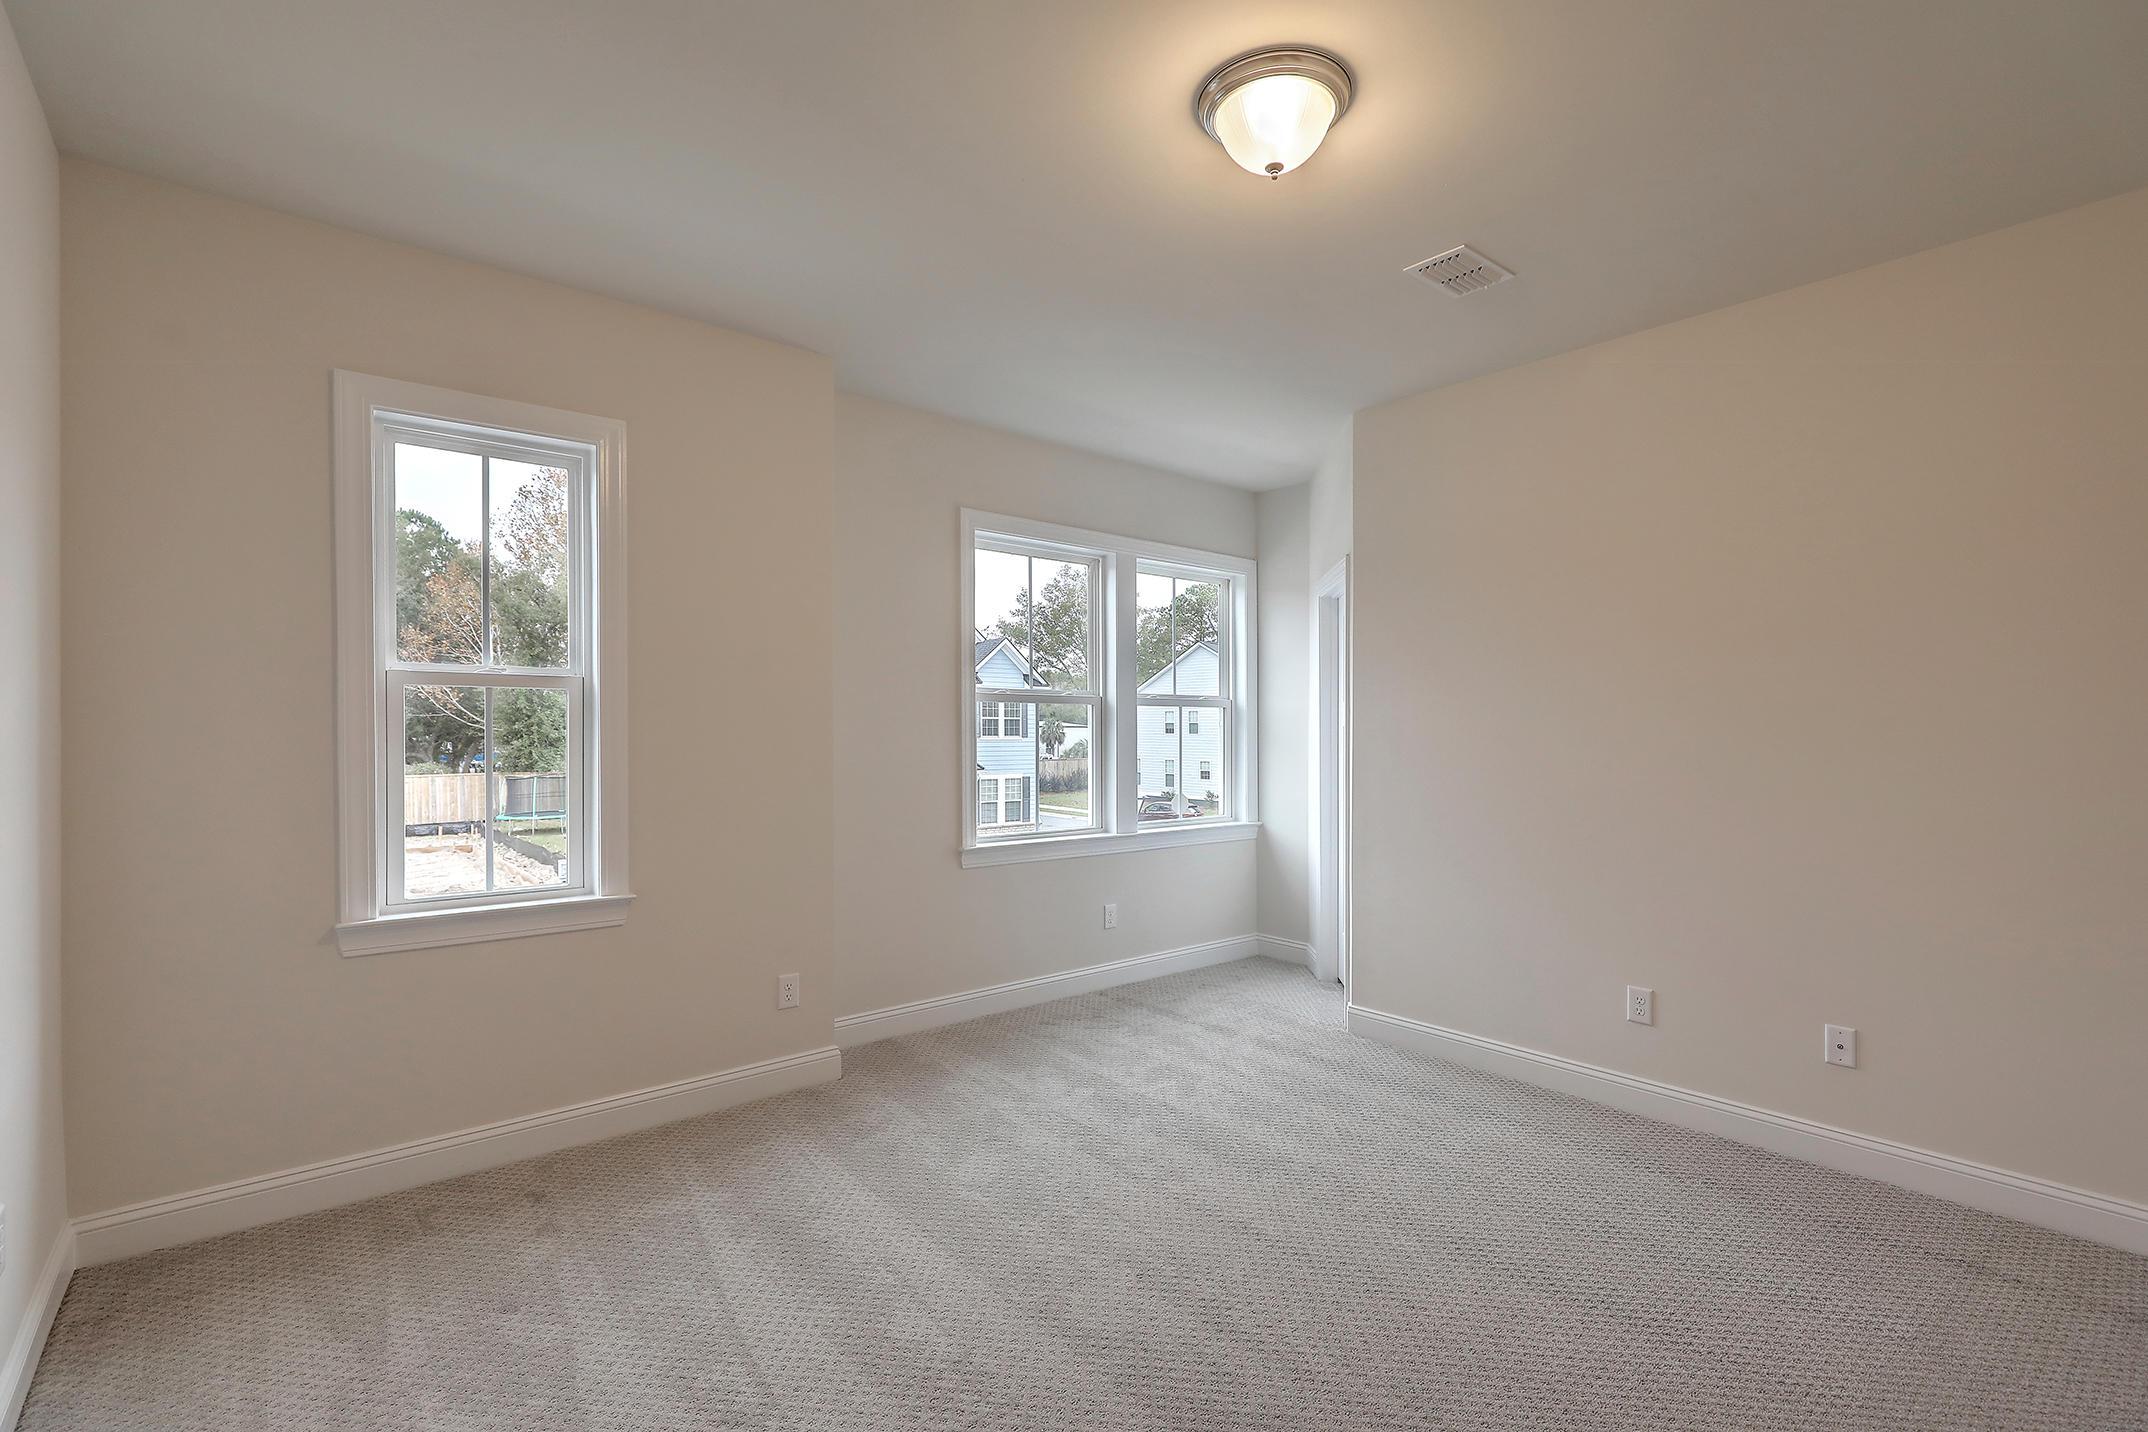 Bentley Park Homes For Sale - 1238 Gannett, Mount Pleasant, SC - 34